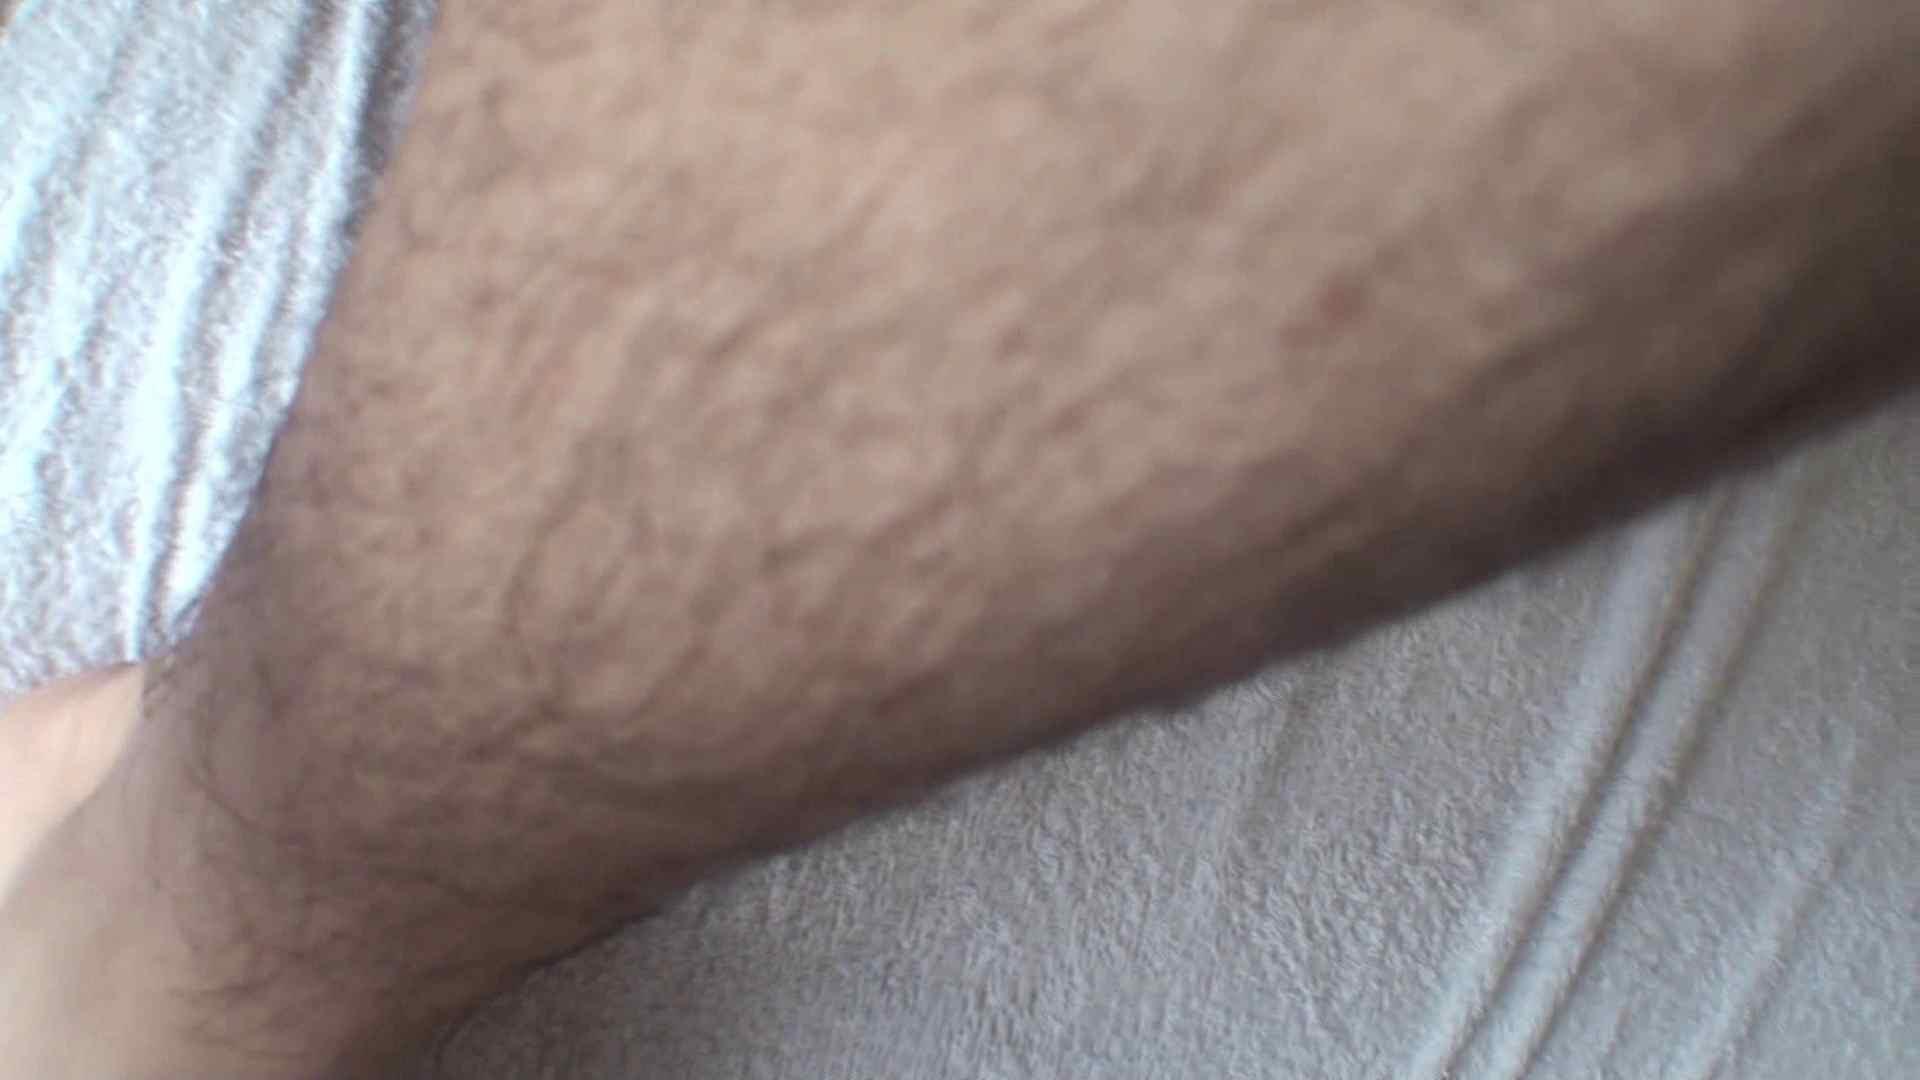 HD 良太と健二当たり前の日常 セックス編 サル系男子 ちんこ画像 65枚 7